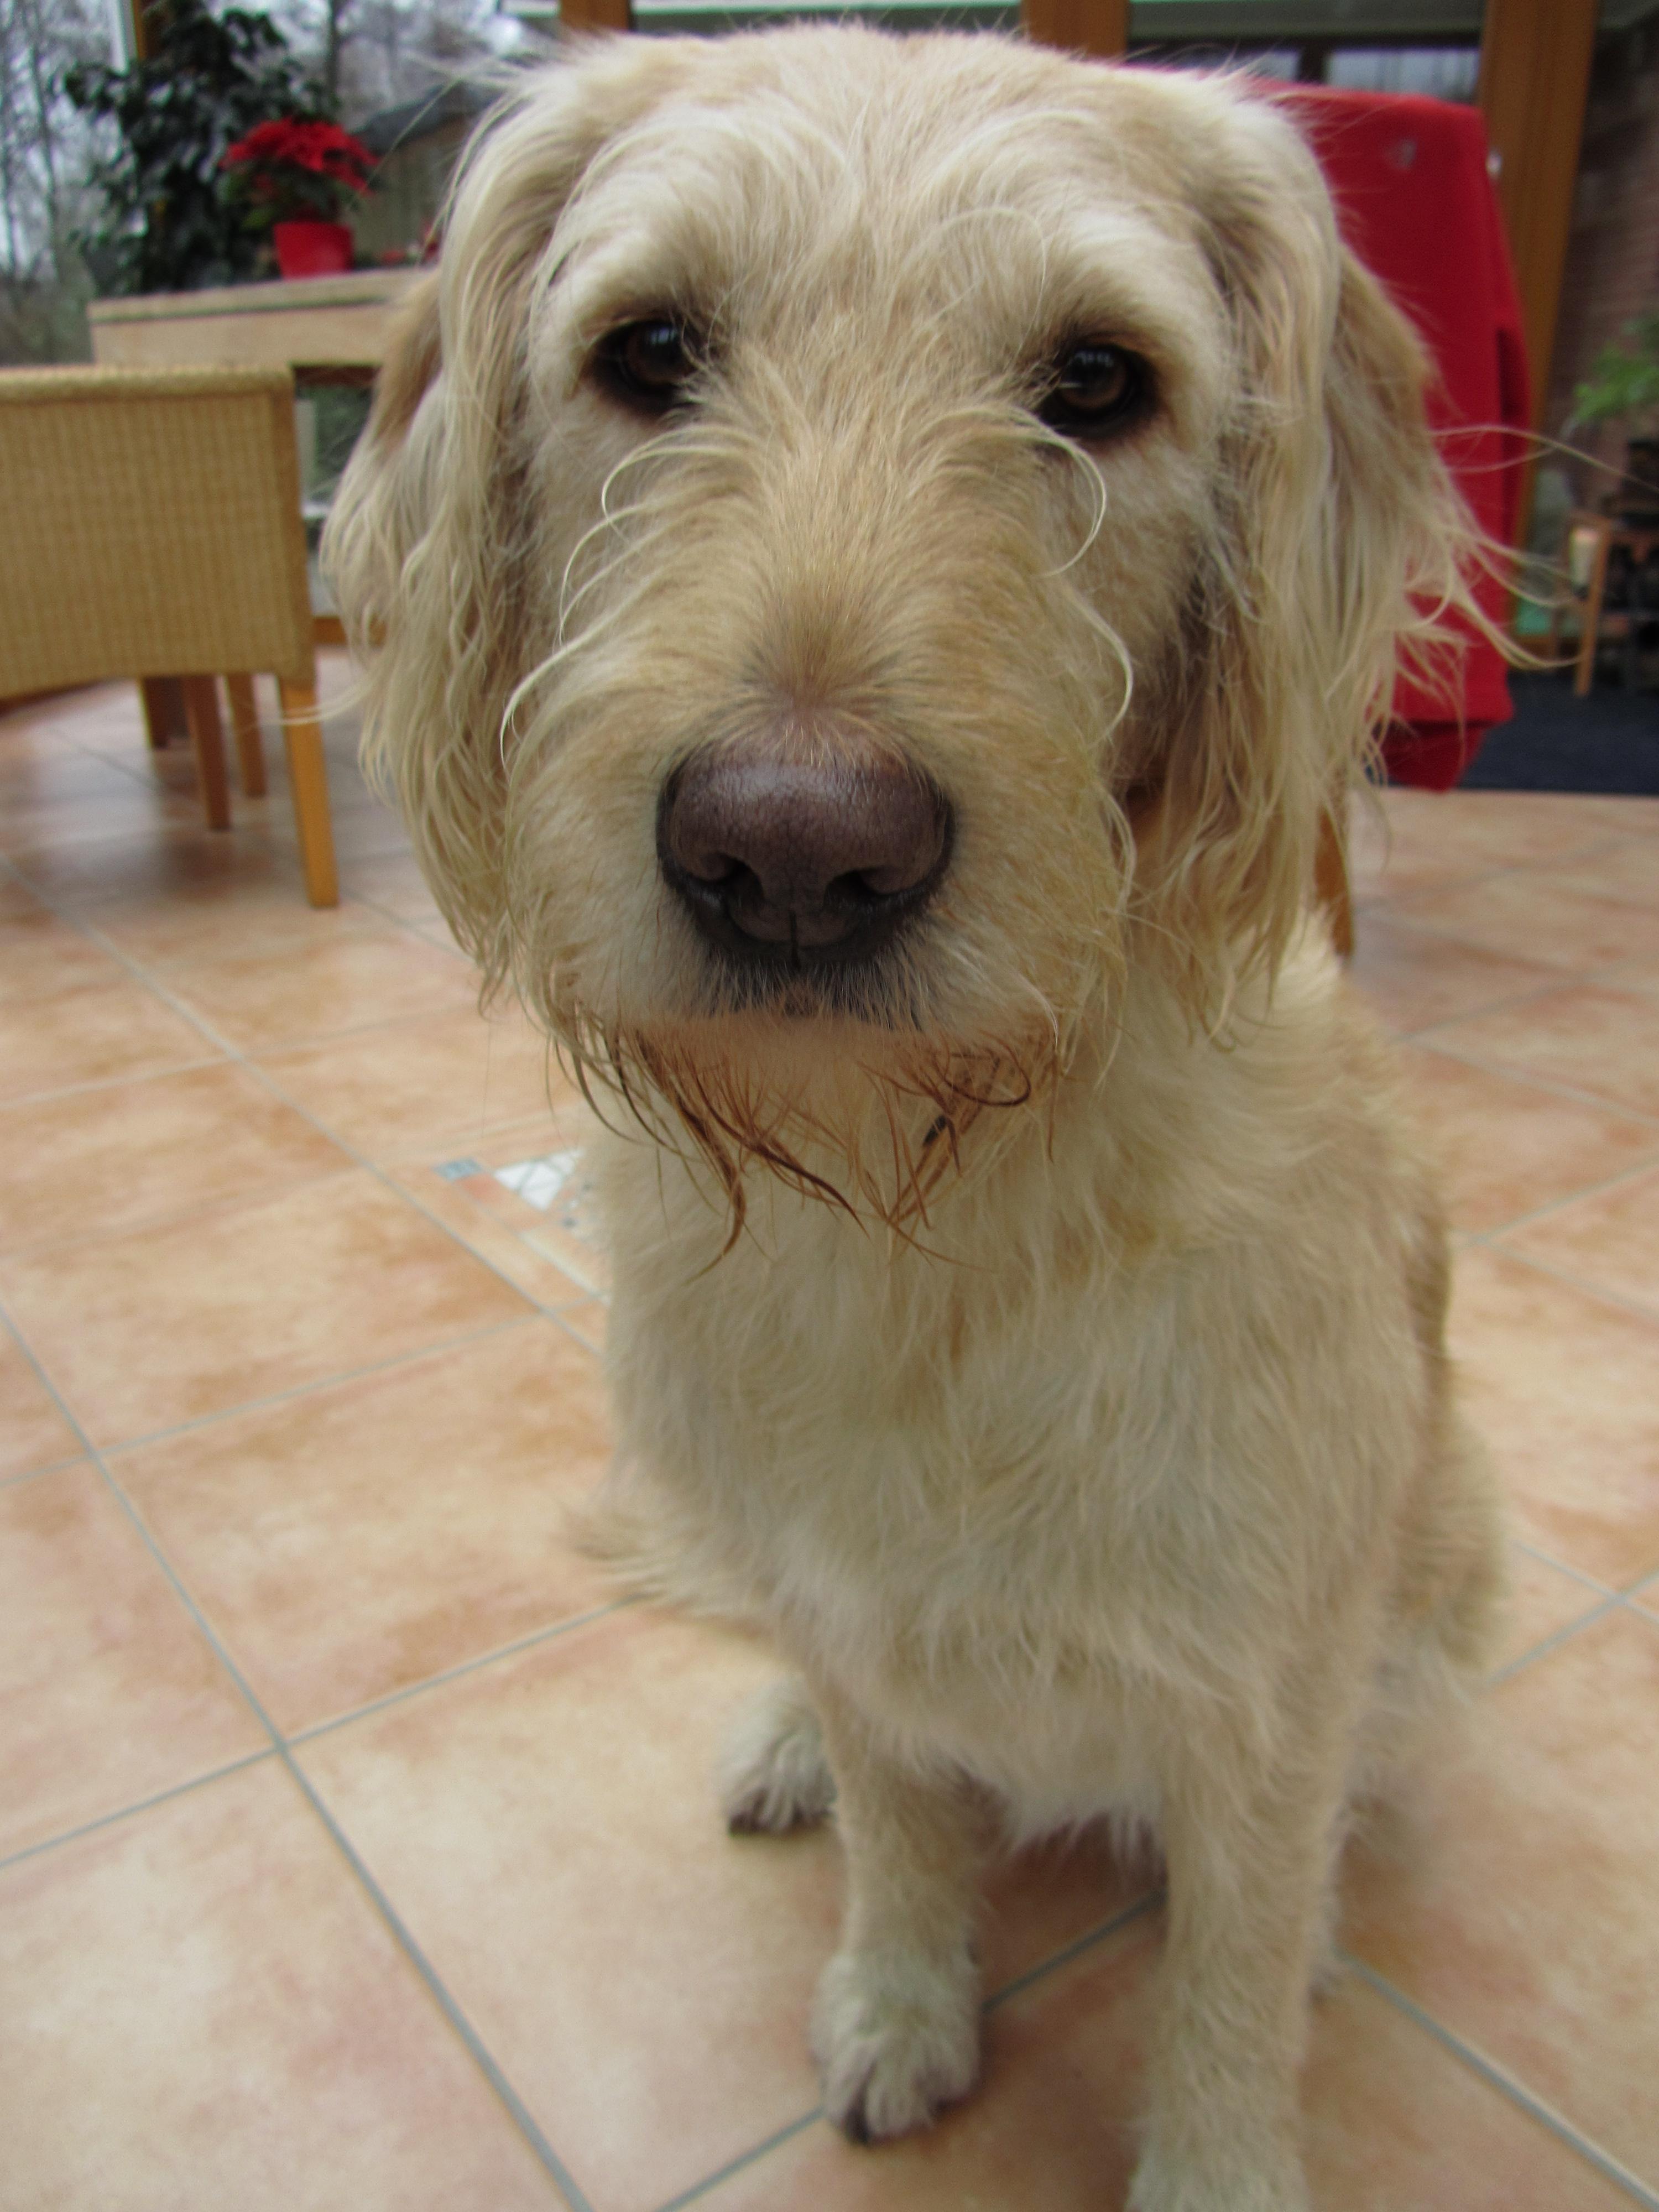 labradoodle labrador retriever and poodle mix - HD3000×4000